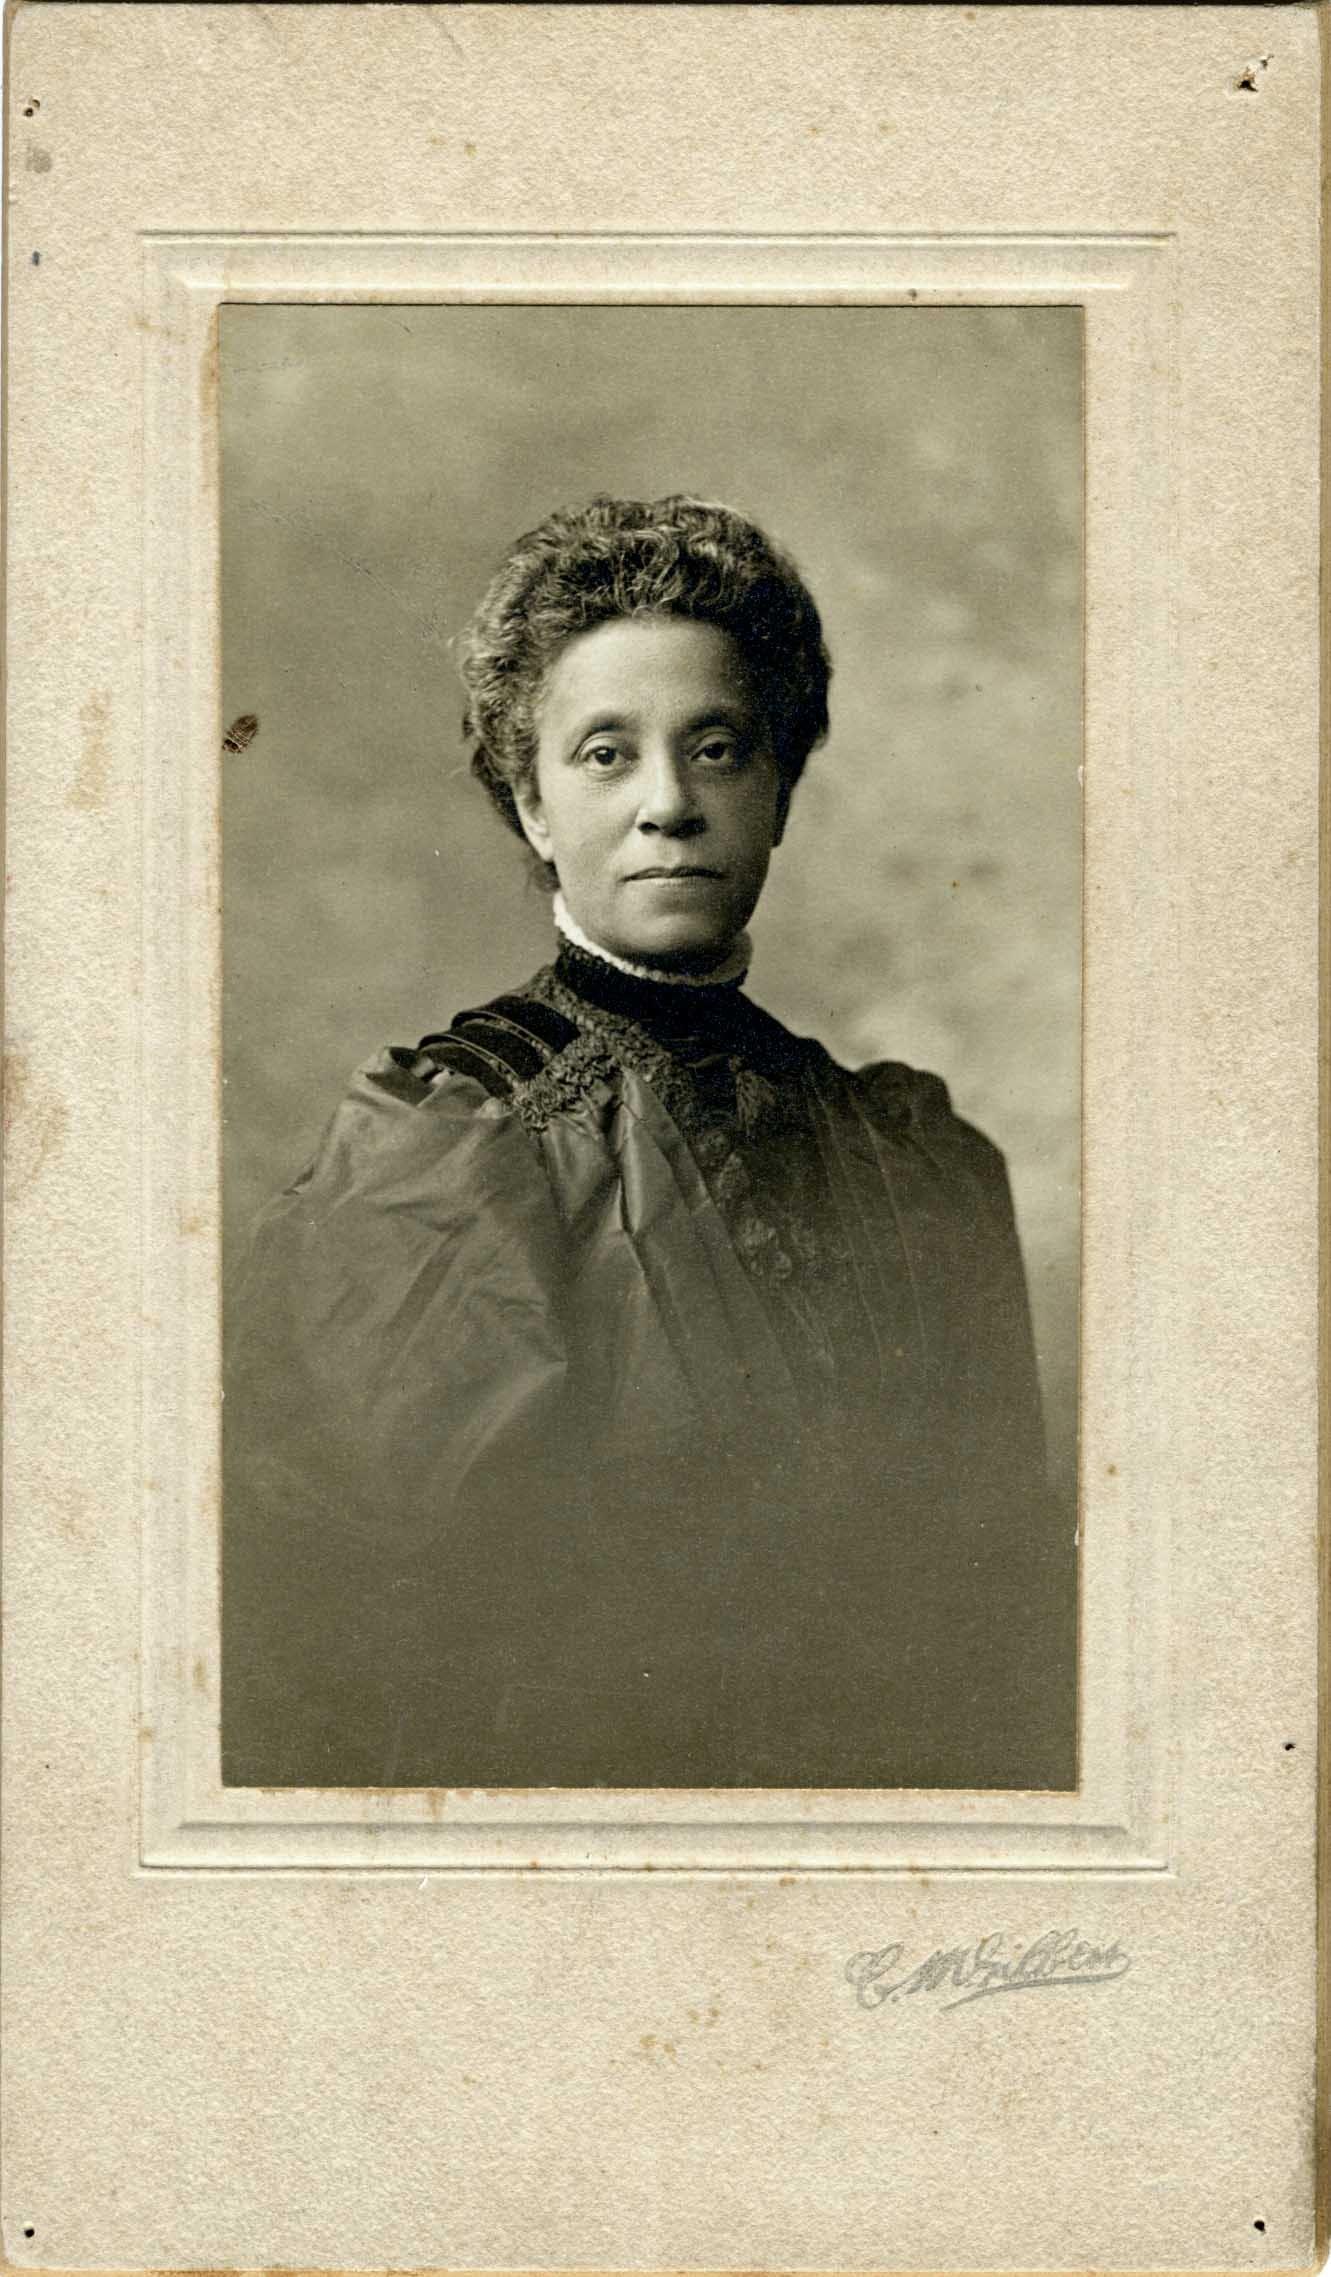 Photo of Gertrude Bustill Mossell.